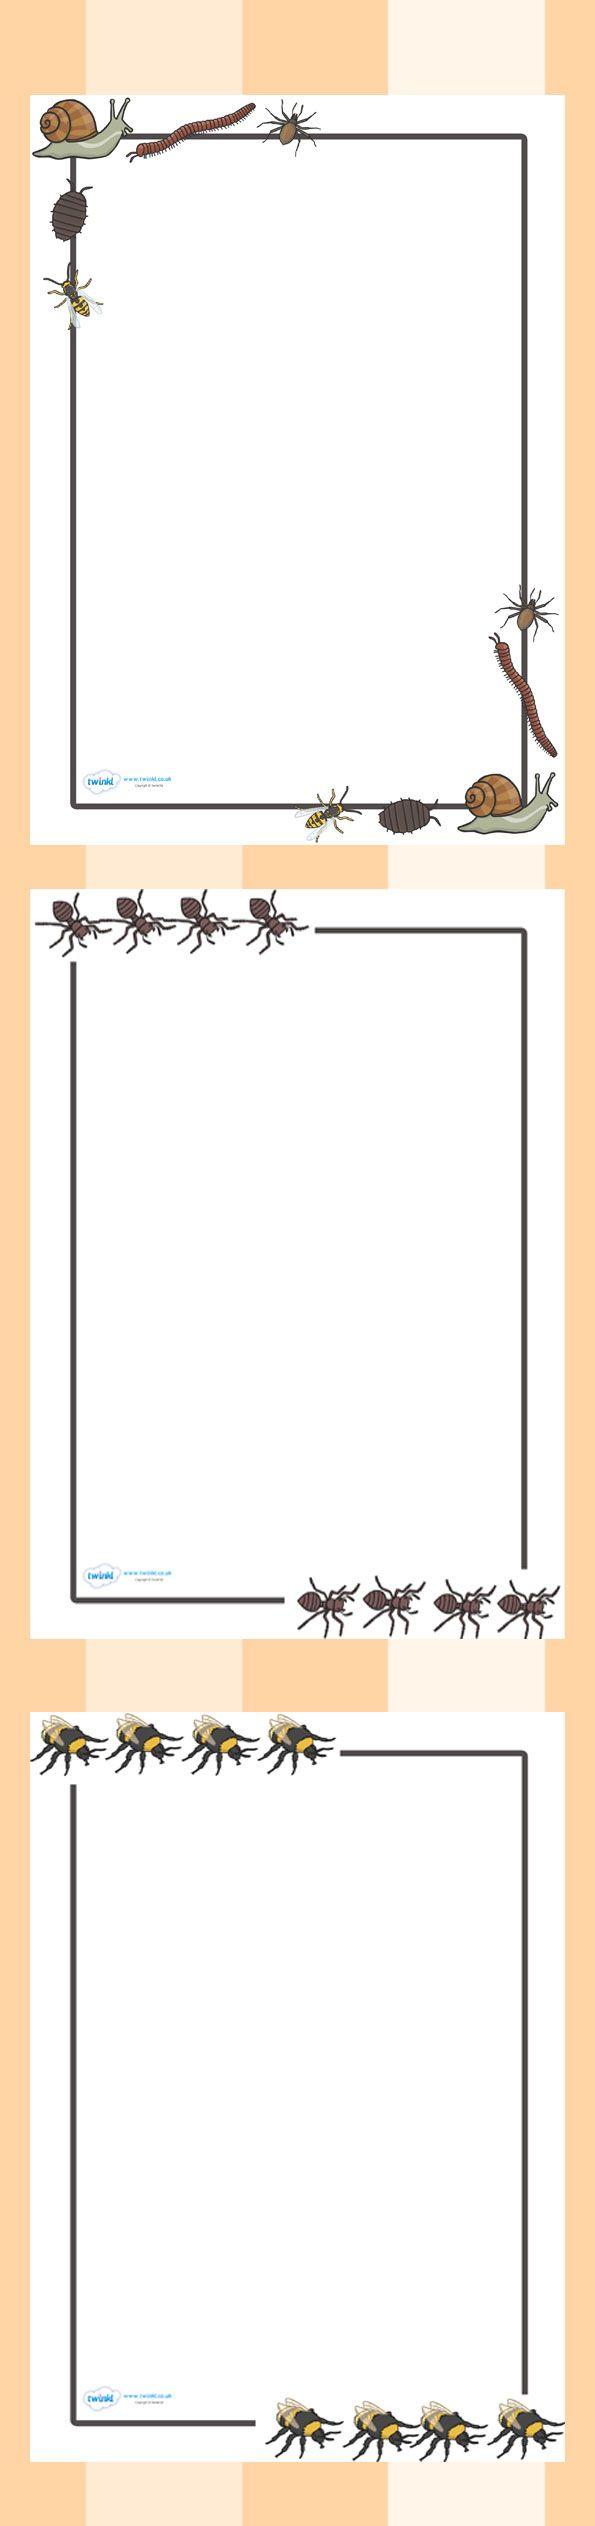 Twinkl Resources >> Minibeast Page Borders  >> Classroom printables for Pre-School, Kindergarten, Elementary School and beyond! Minibeasts, Printable Writing Paper, Borders